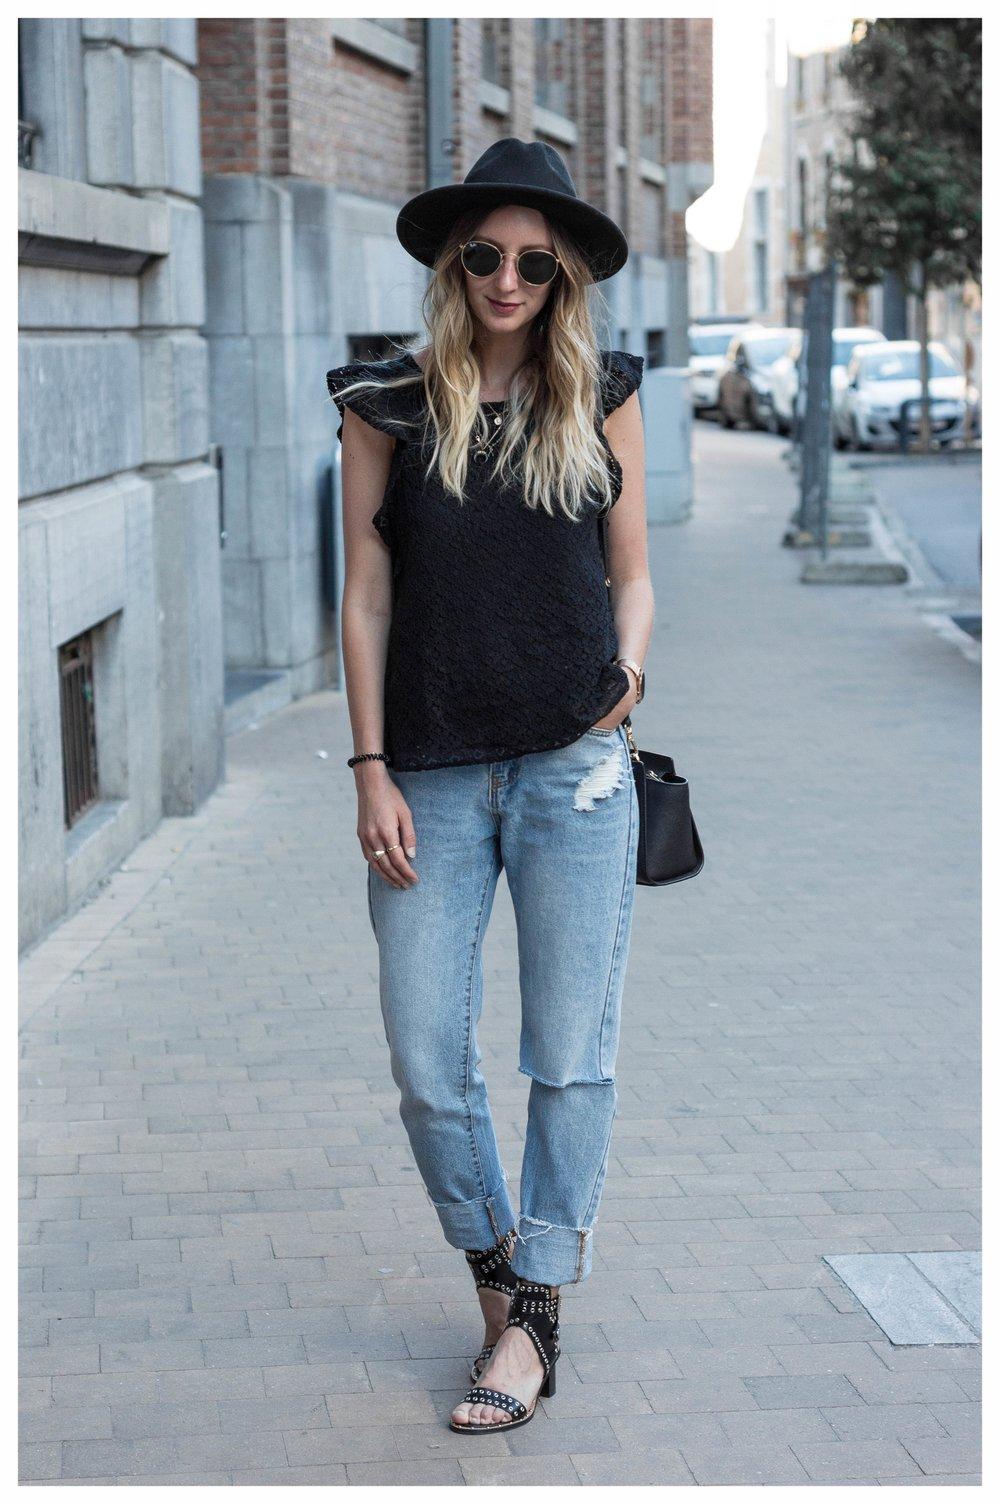 Street Style Namur - OSIARAH.COM (11 of 19).jpg